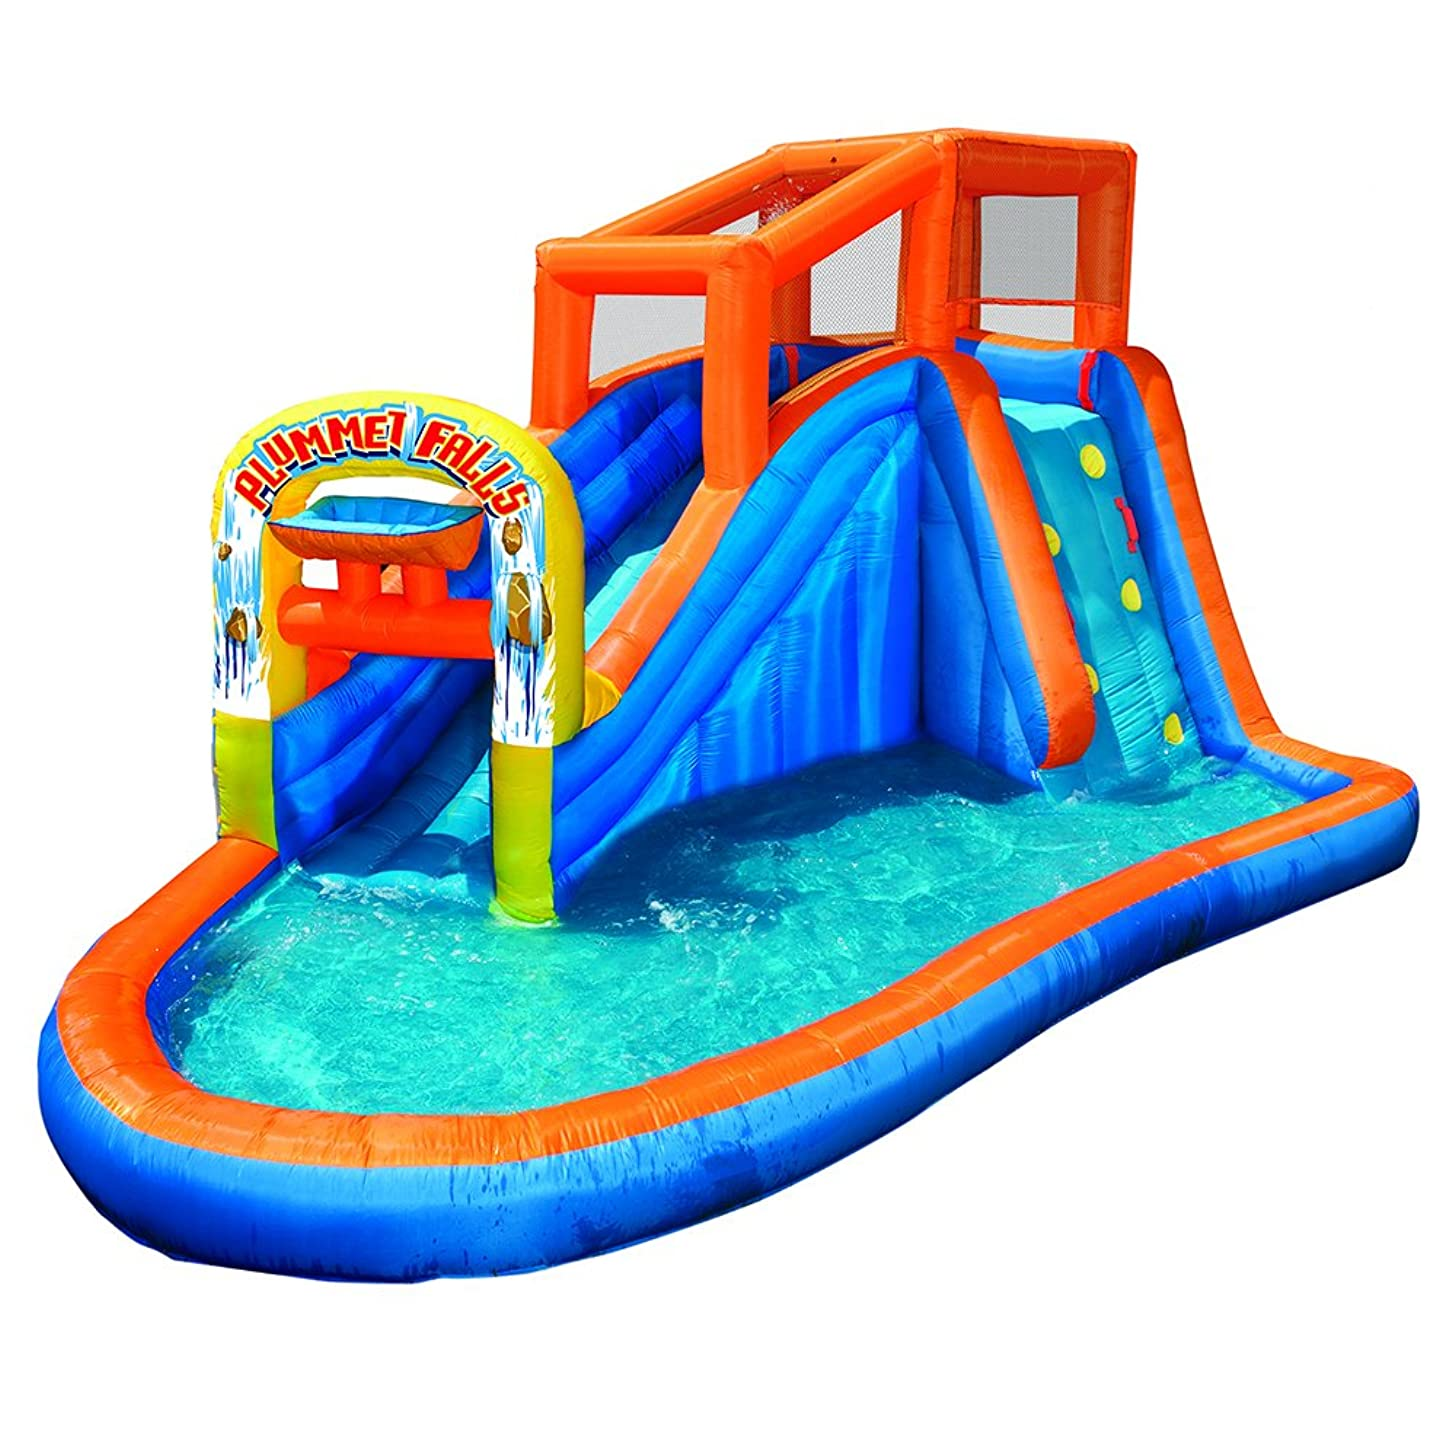 BANZAI 35543 Plummet Falls Adventure Slide Inflatable Water Park, Multicolor